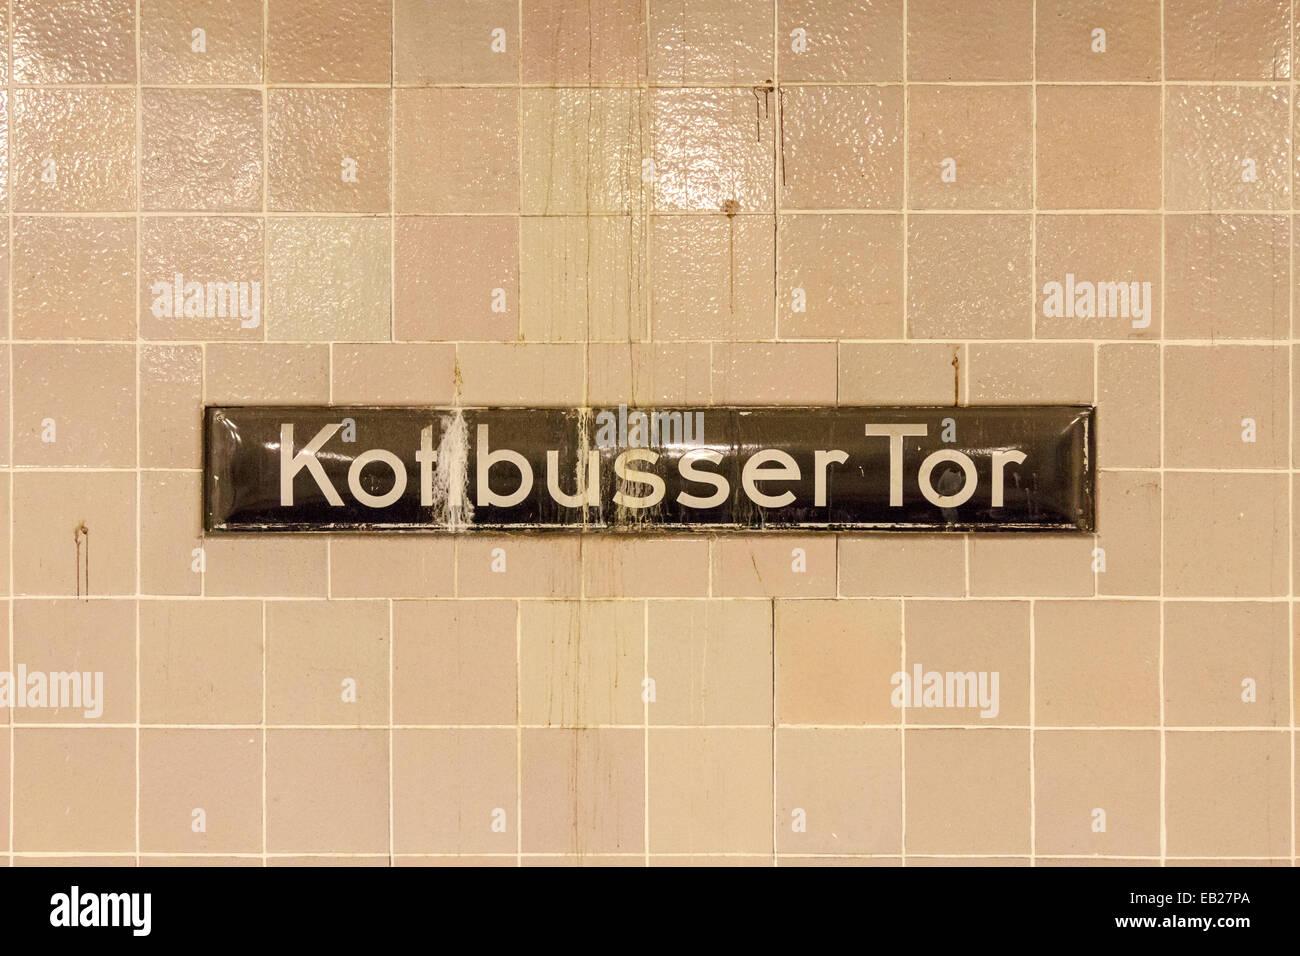 u bahn station schild am kottbusser tor in kreuzberg berlin deutschland stockfoto bild. Black Bedroom Furniture Sets. Home Design Ideas